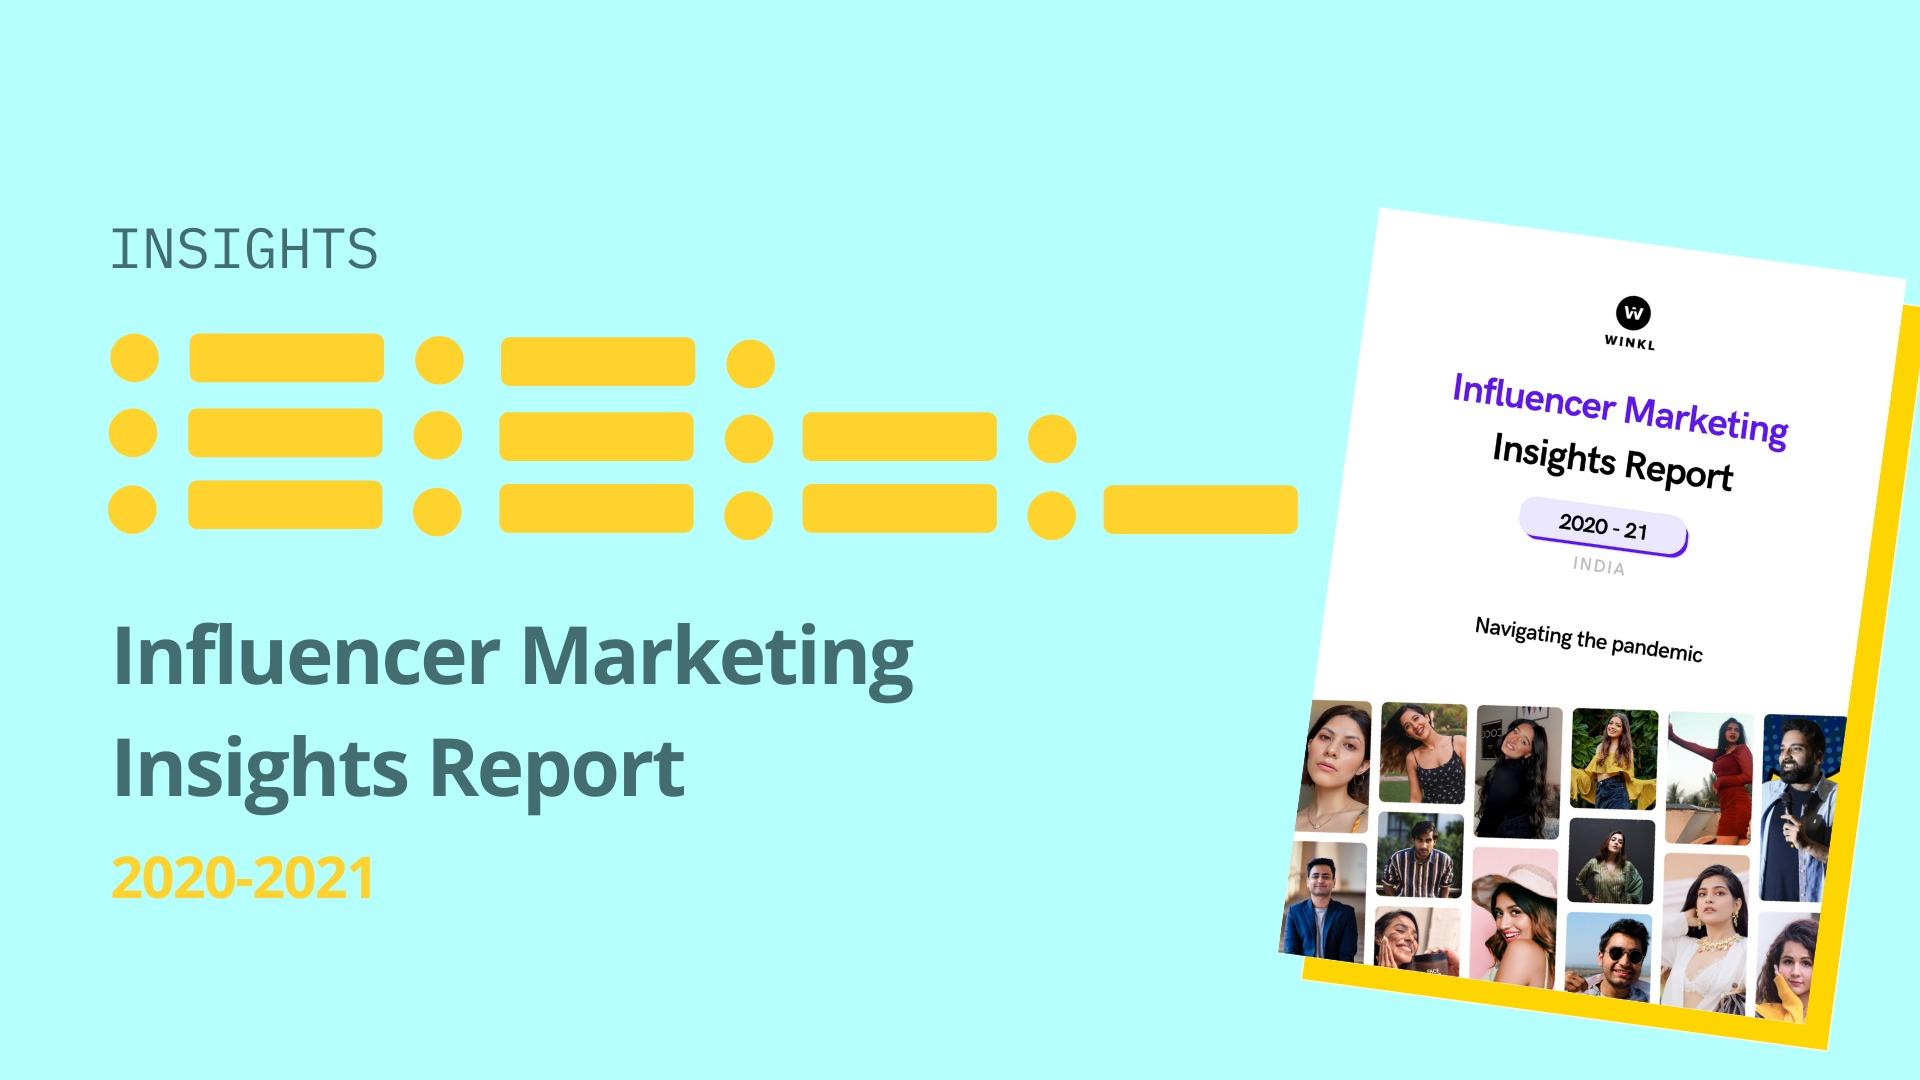 Navigating the Pandemic: Winkl Influencer Marketing Benchmark Report 2020-2021 - blog by Winkl (An influencer marketing platform)